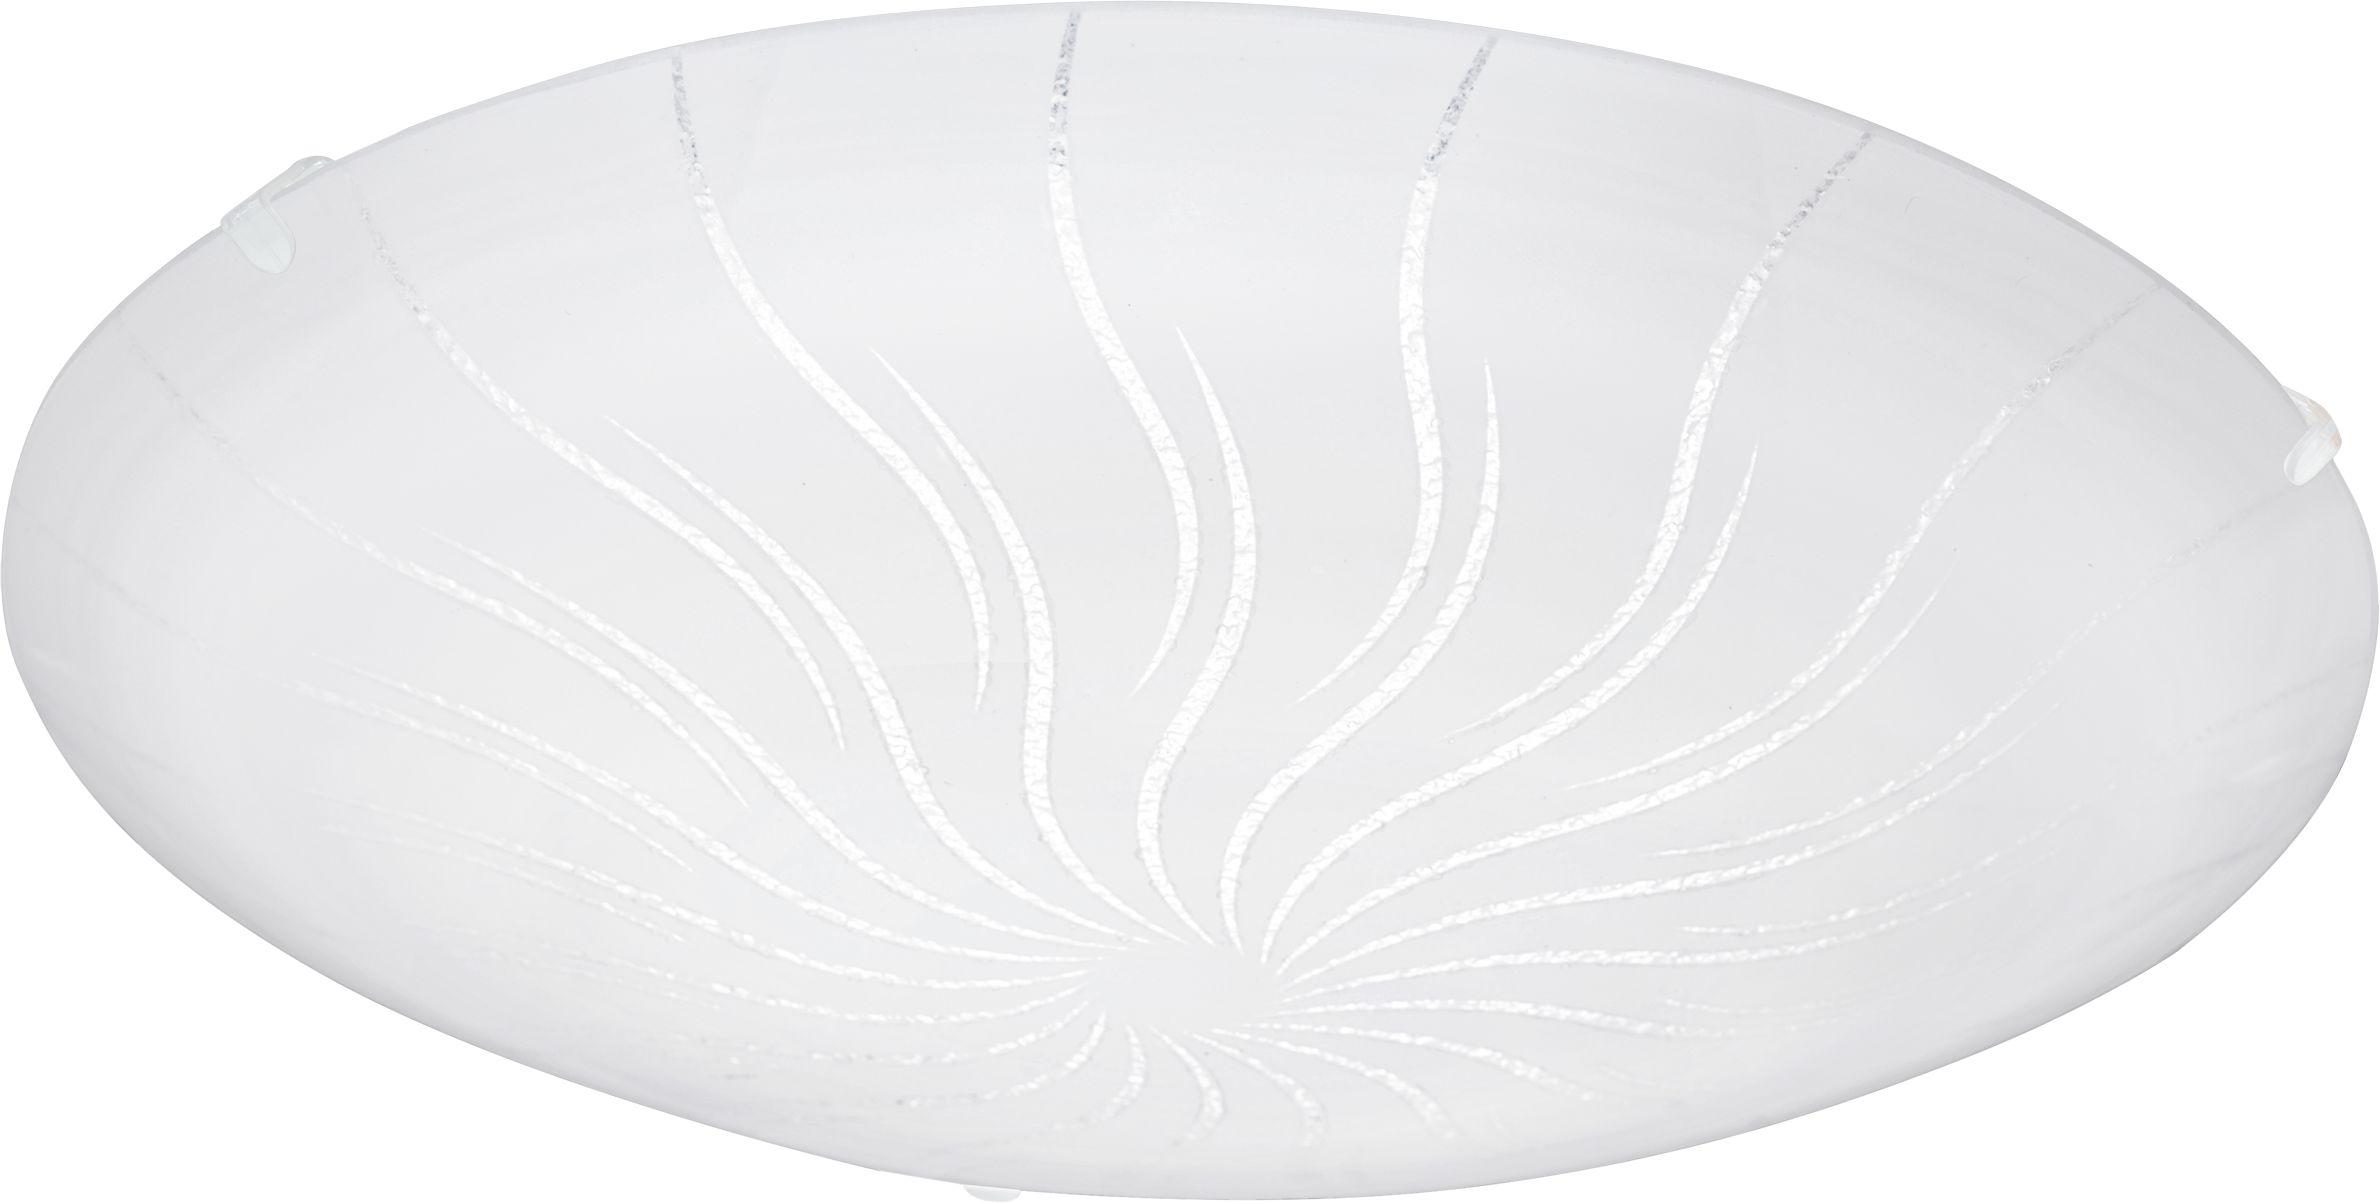 Eglo plafon LED Margitta 1 96091 - SUPER OFERTA - RABAT w koszyku